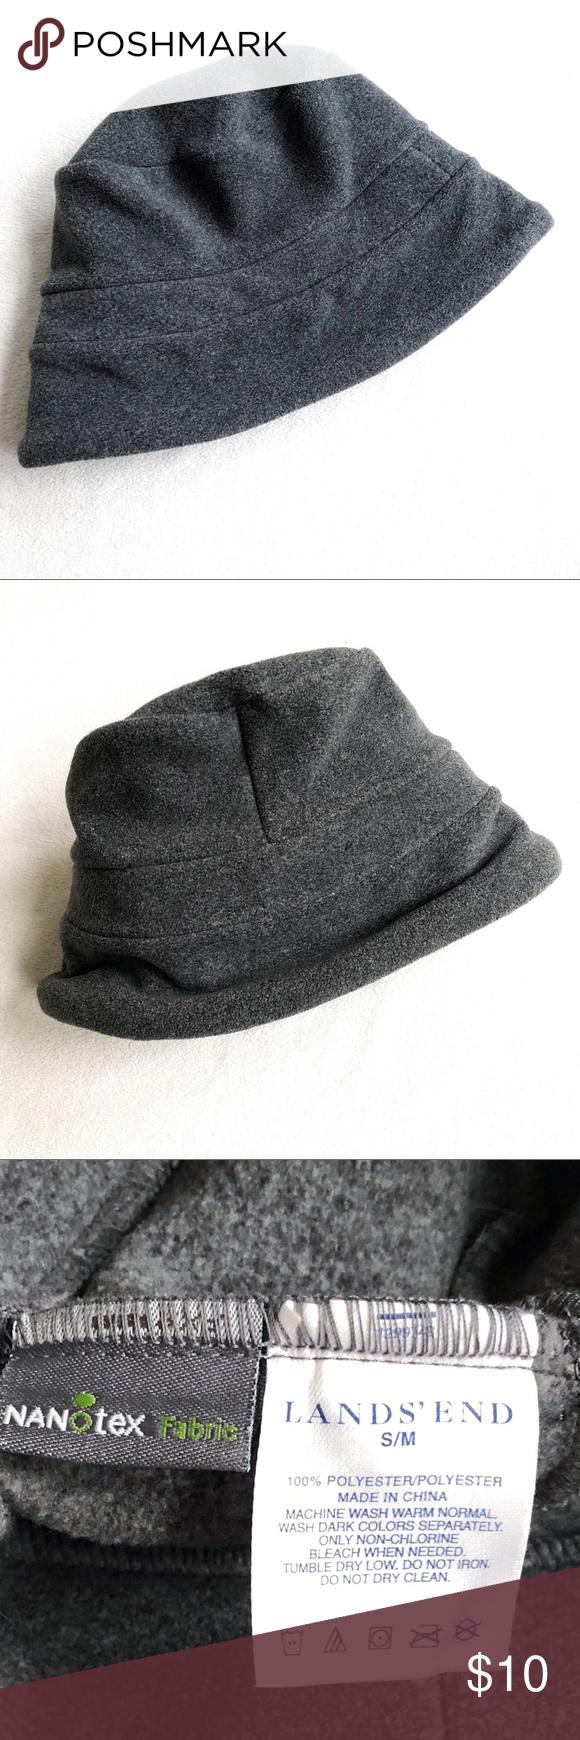 7  25⚡️Lands  End NanoTech Sherpa Fleece Hat Lands  End NanoTech Sherpa  Fleece Bucket Hat Like New Condition Cozy Charcoal Grey Sherpa Fleece Very  Warm ... 5c3fb0042a7